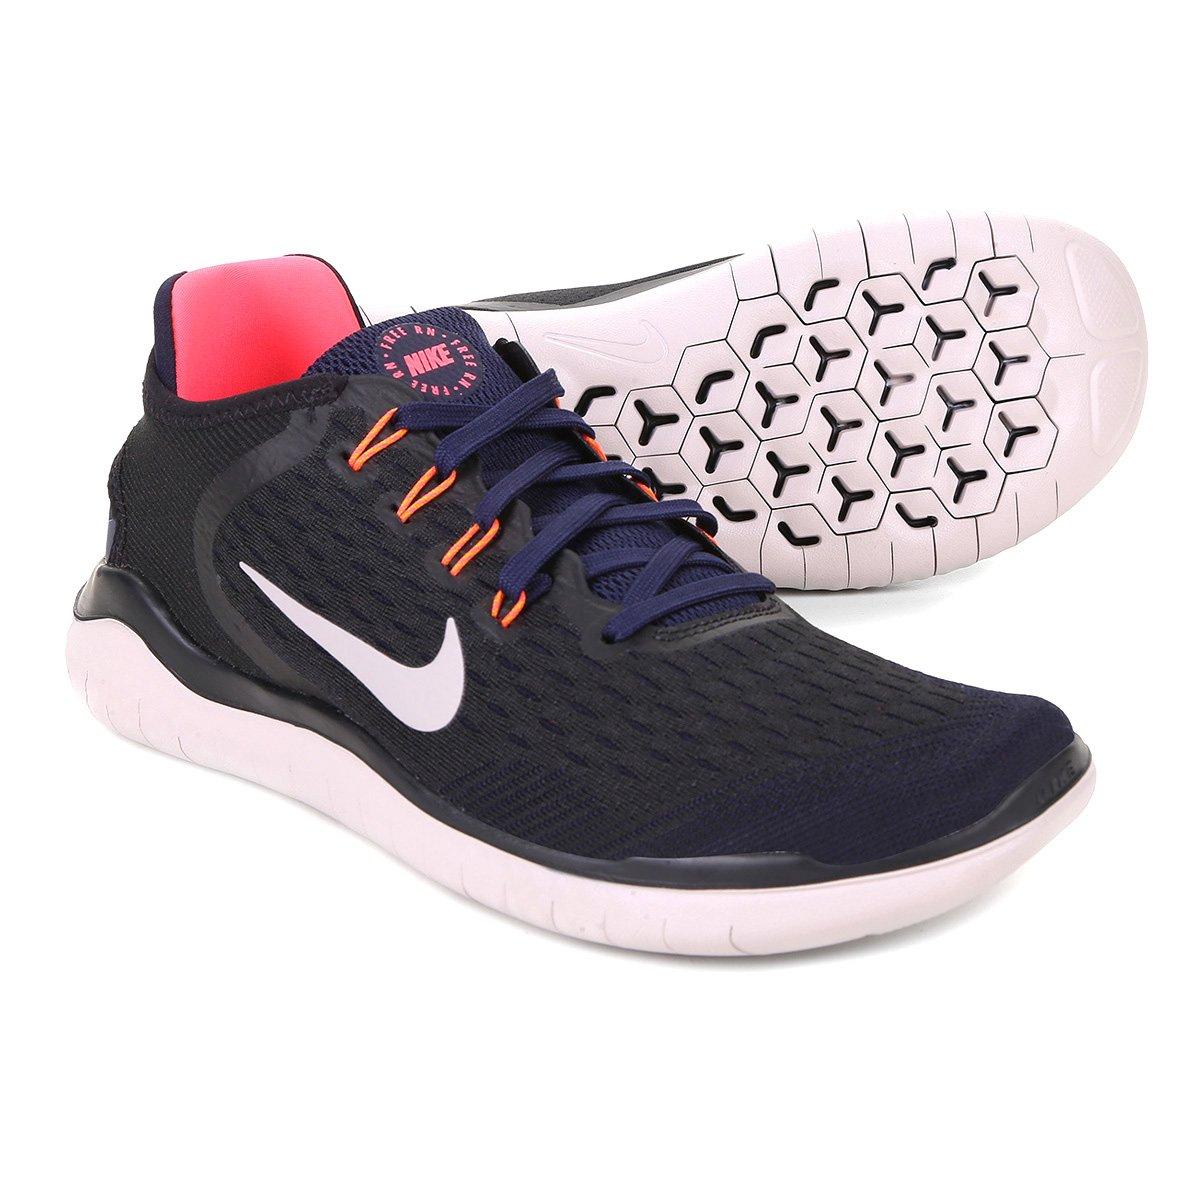 d77f6e077f2 Tênis Nike Free Rn 2018 Masculino - Preto e Azul - Compre Agora ...